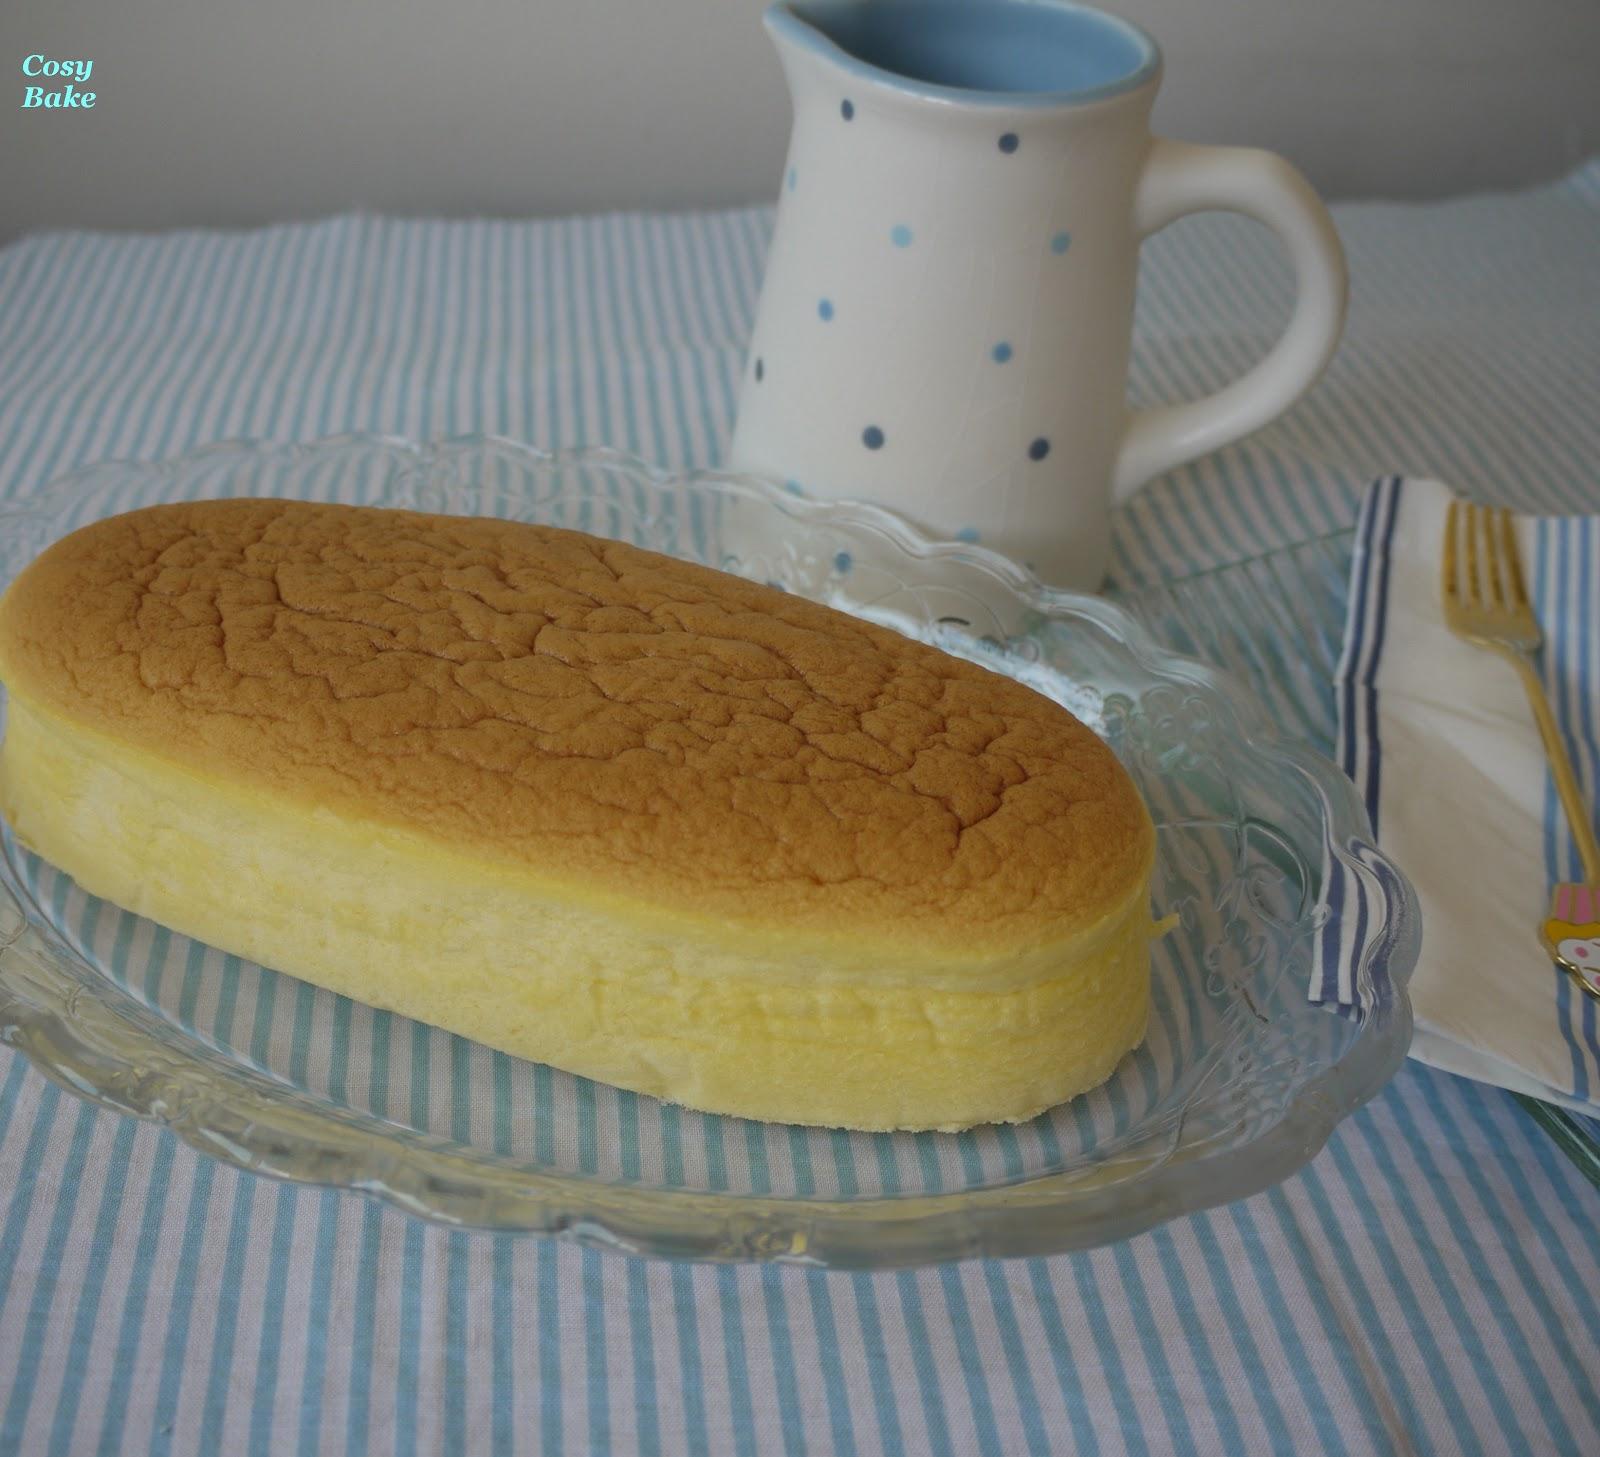 Japanese Cream Cheese Cake Without Cream Of Tartar